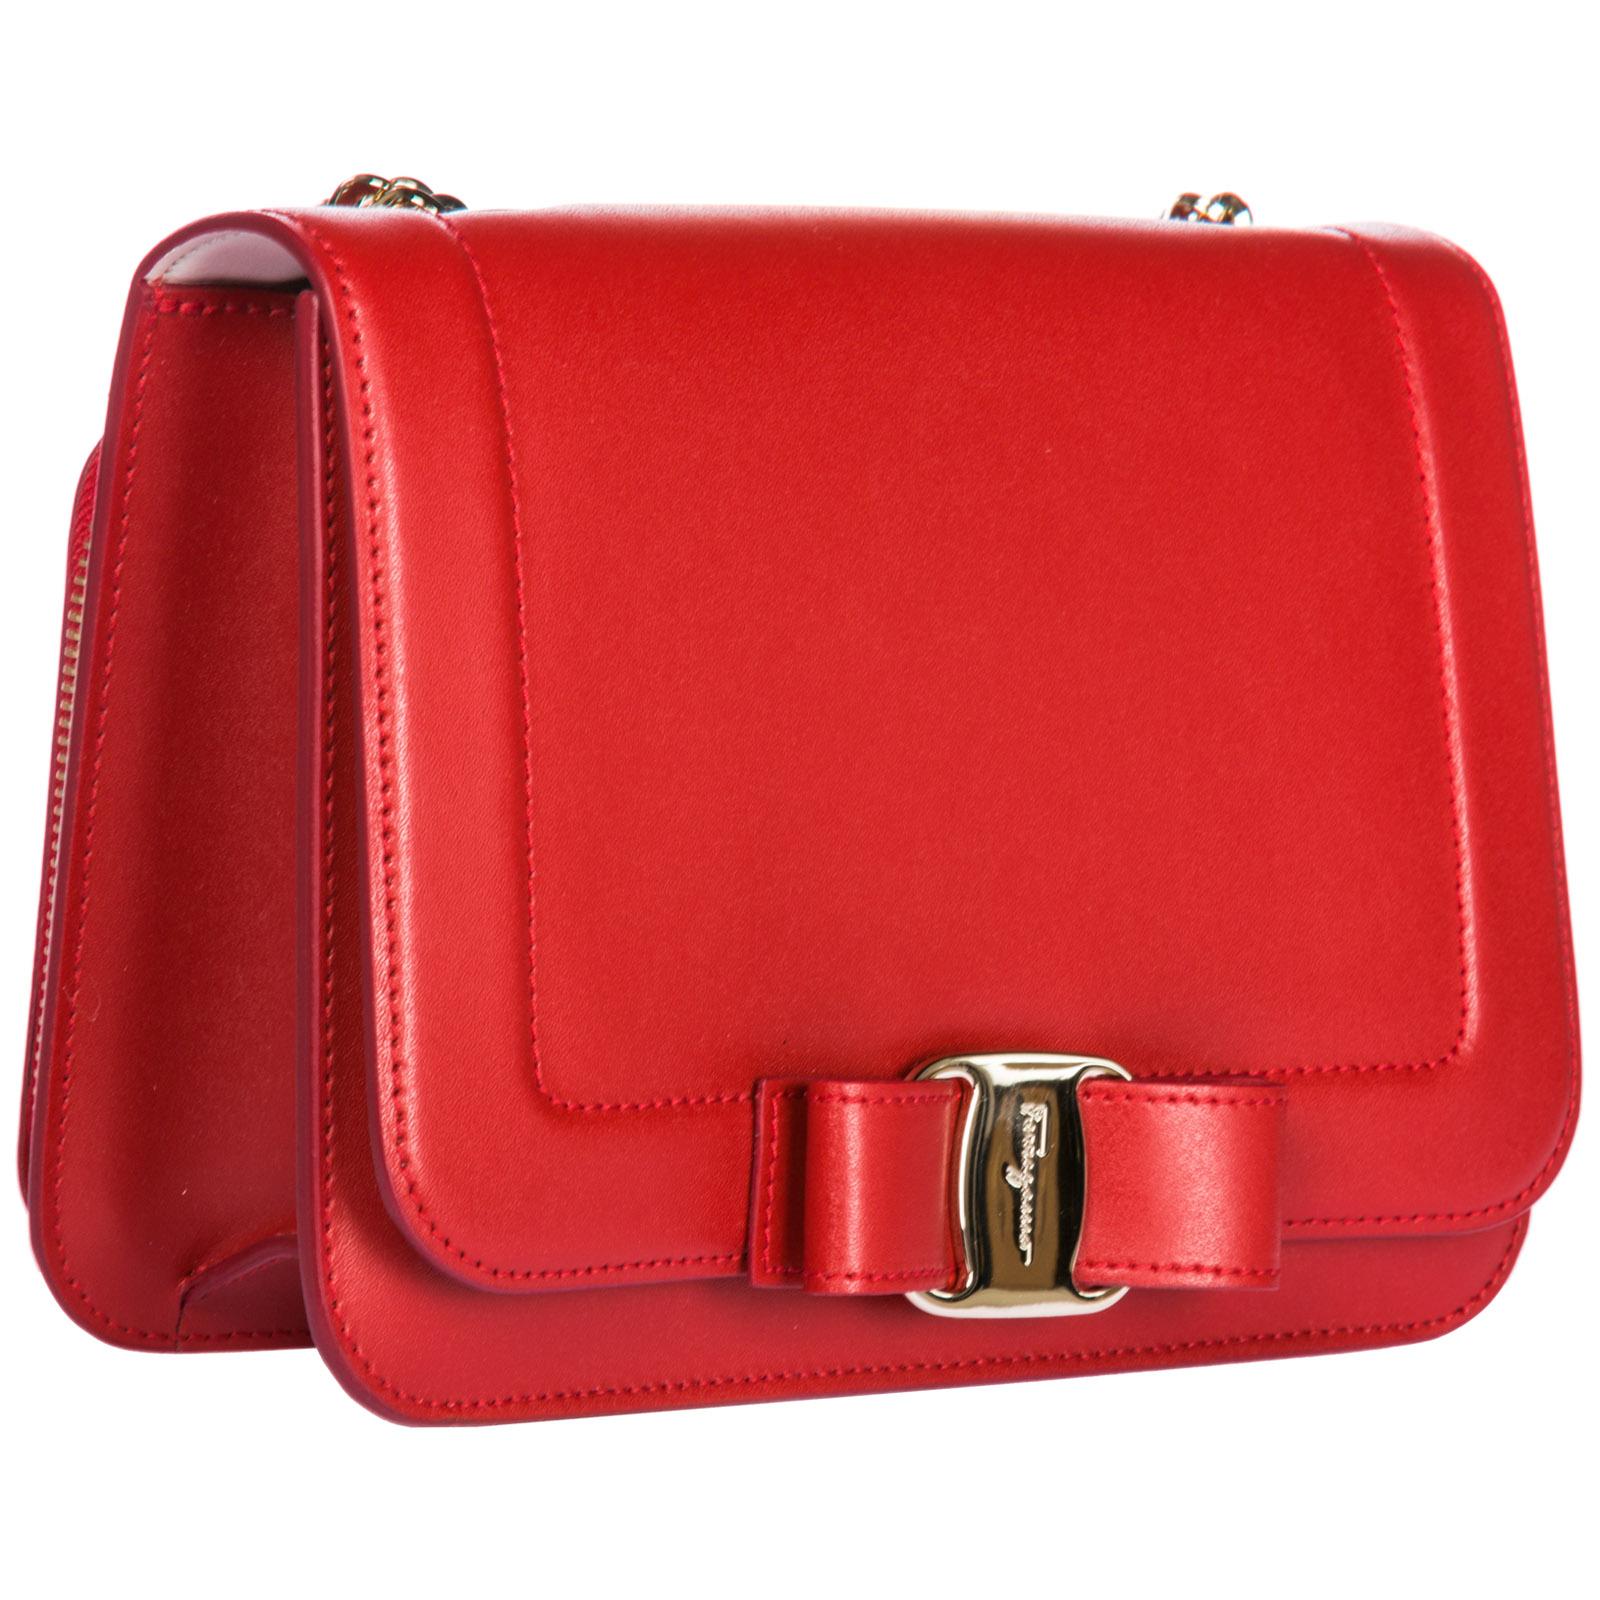 809f2ed6cadd Salvatore Ferragamo Women s leather cross-body messenger shoulder bag vara  rainbow